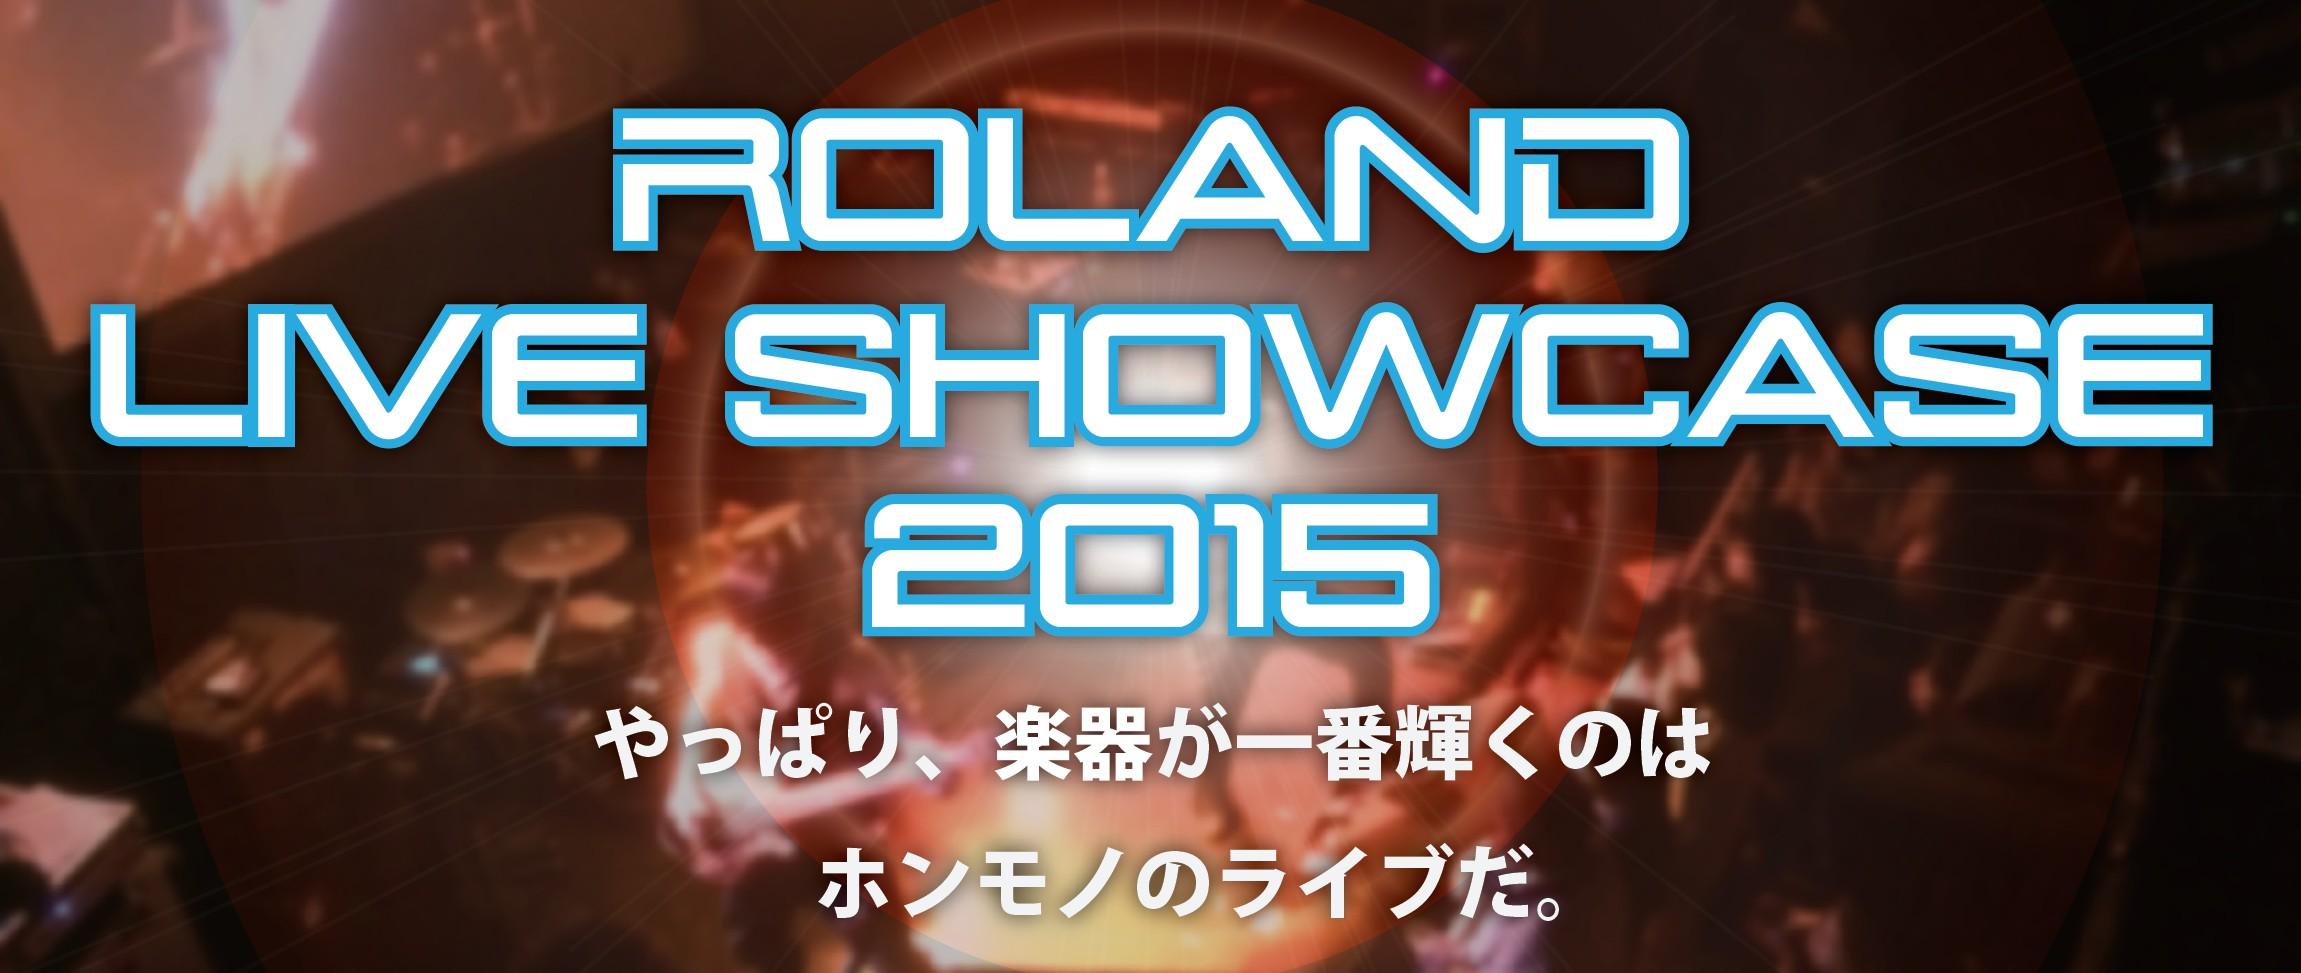 ROLAND LIVE SHOW CASE 2015